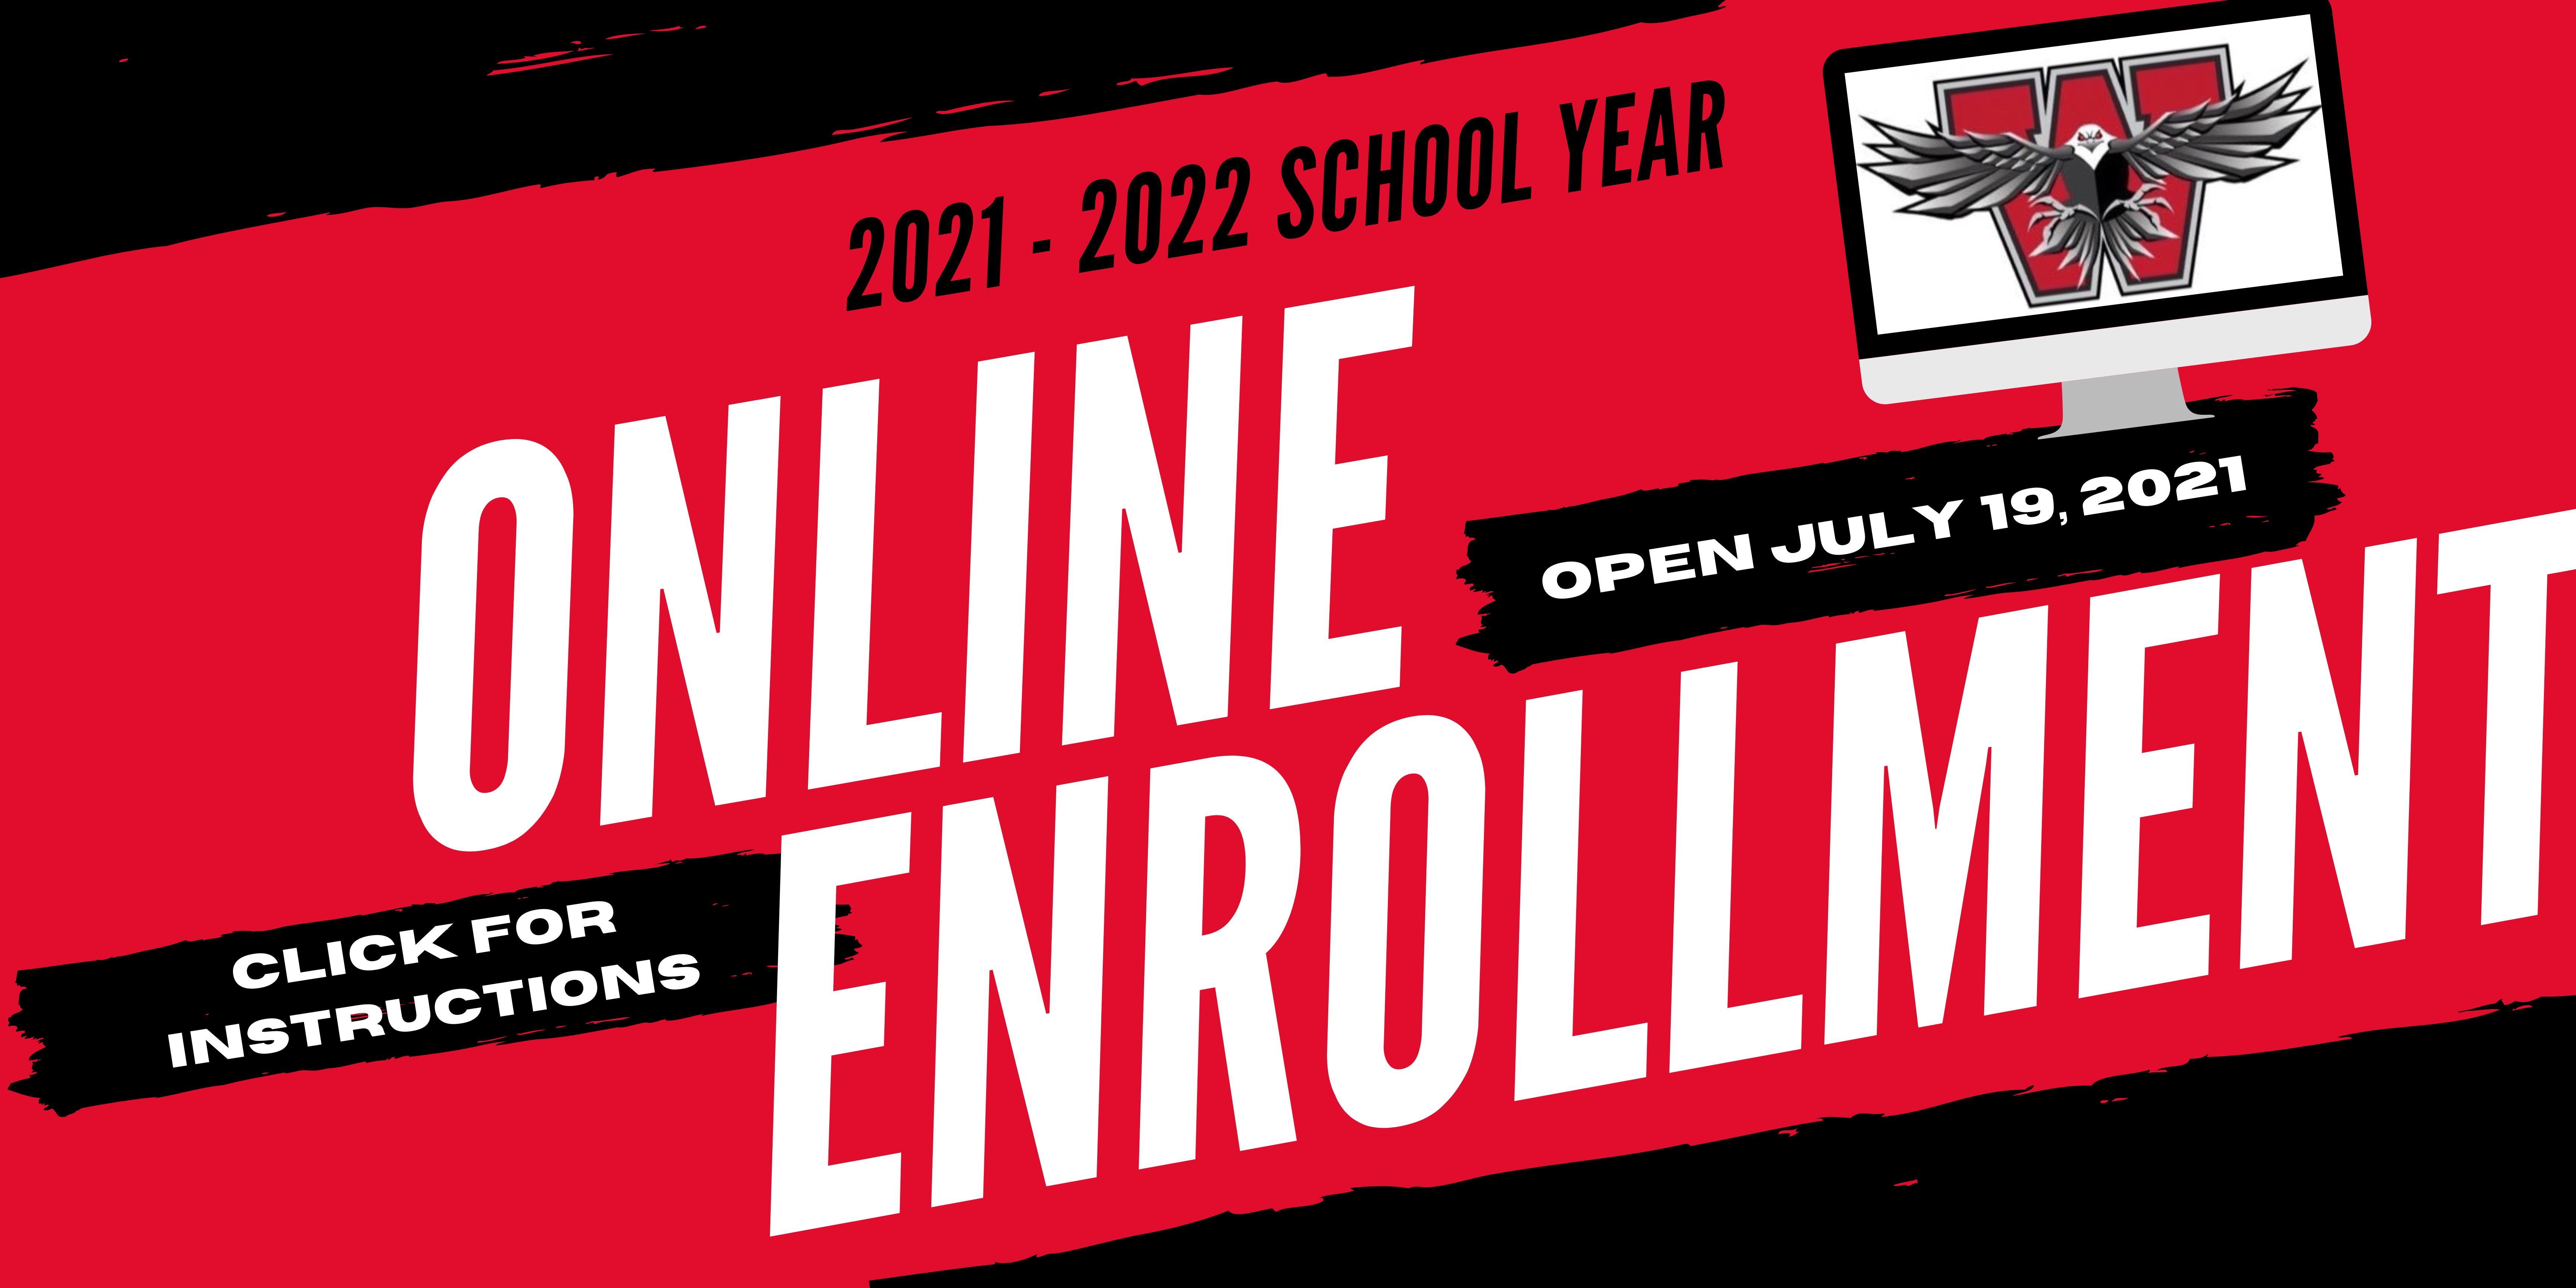 Online Enrollment Instructions - English